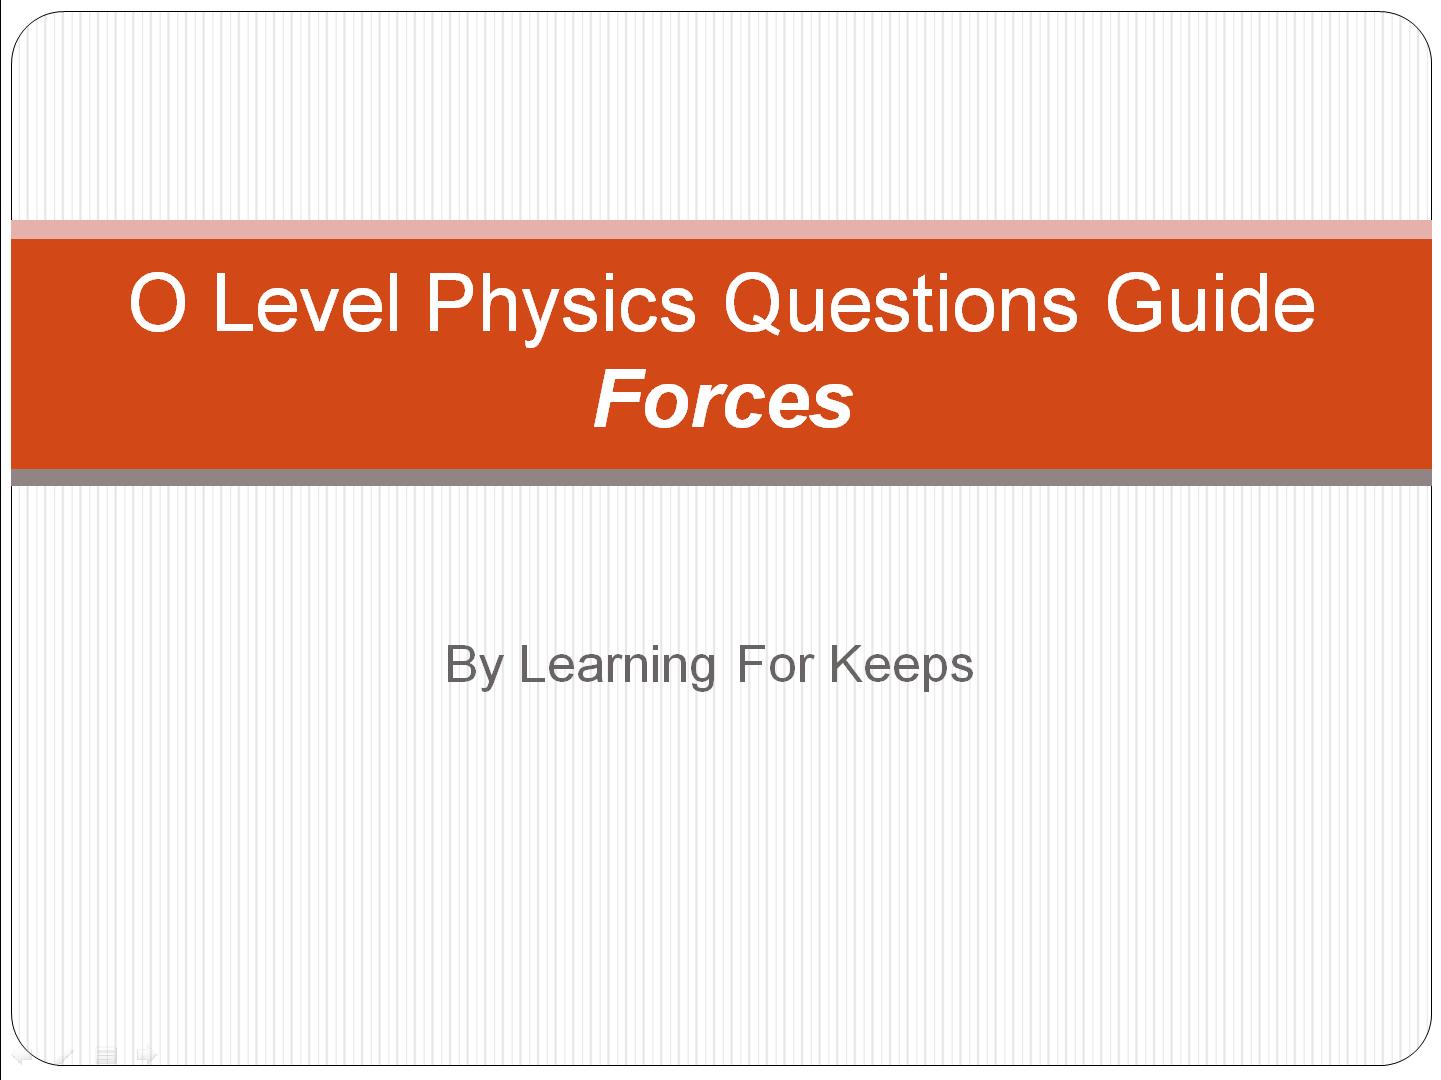 Question Guide Forces